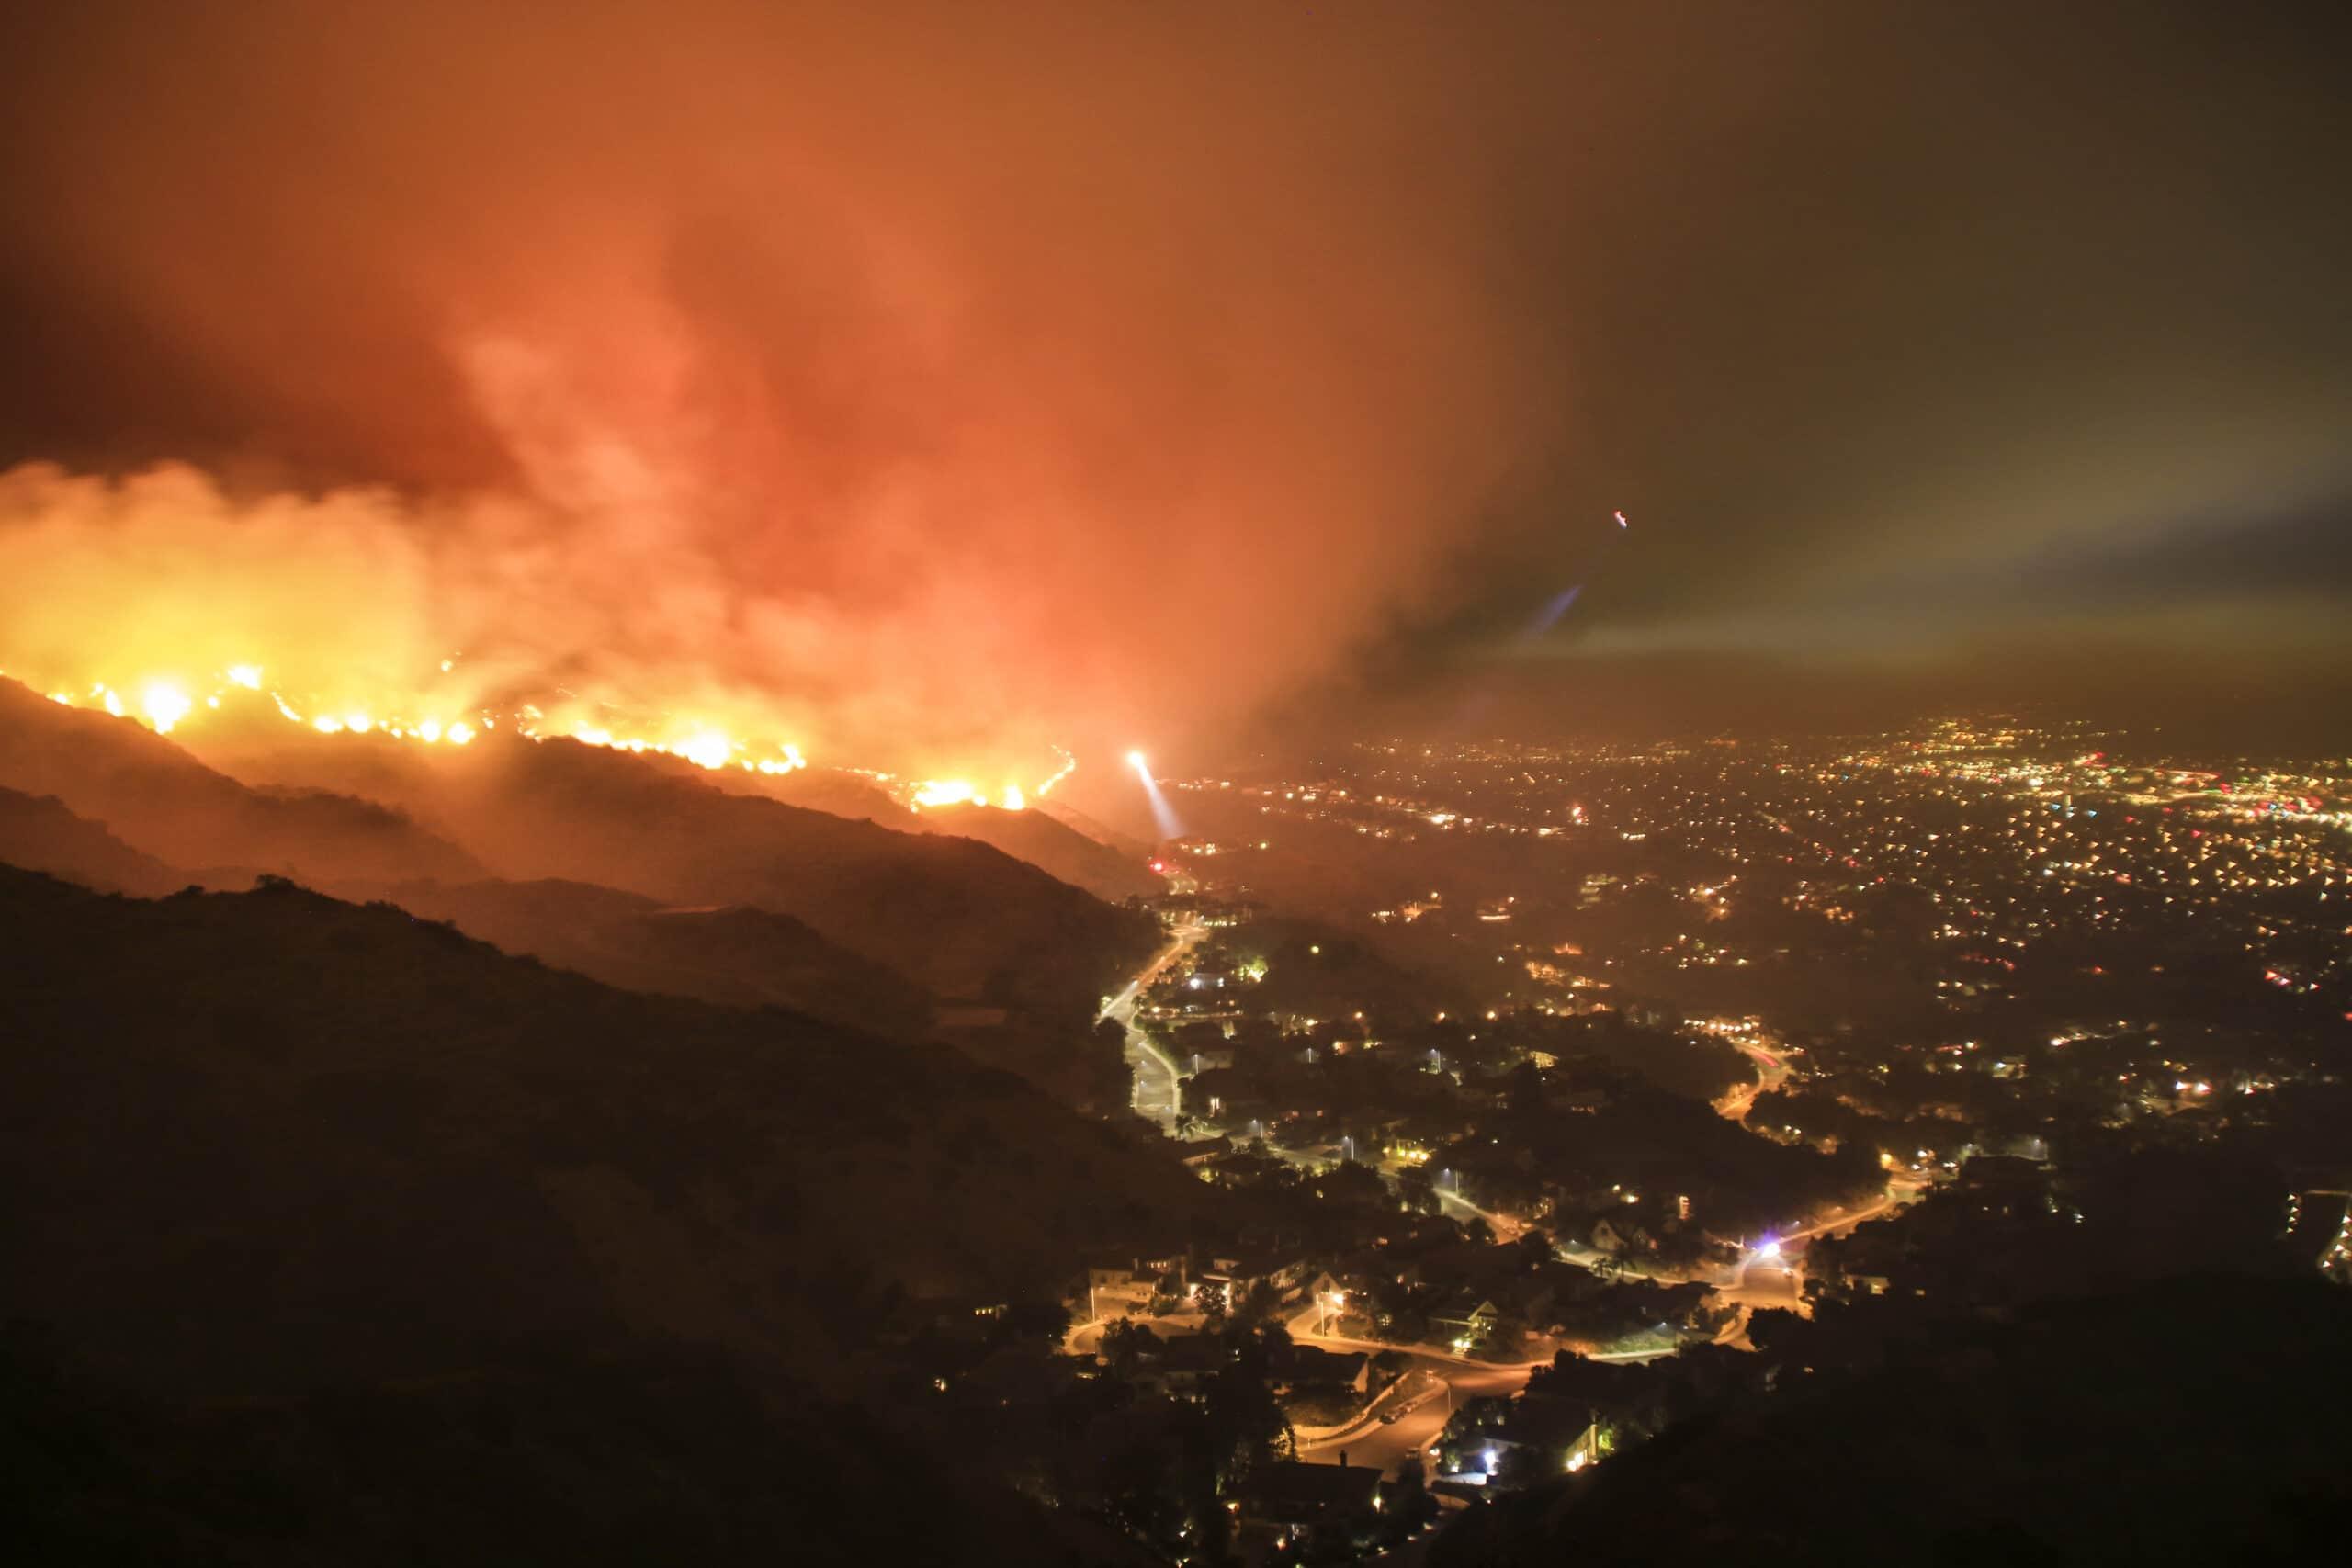 Fire burning on mountainside